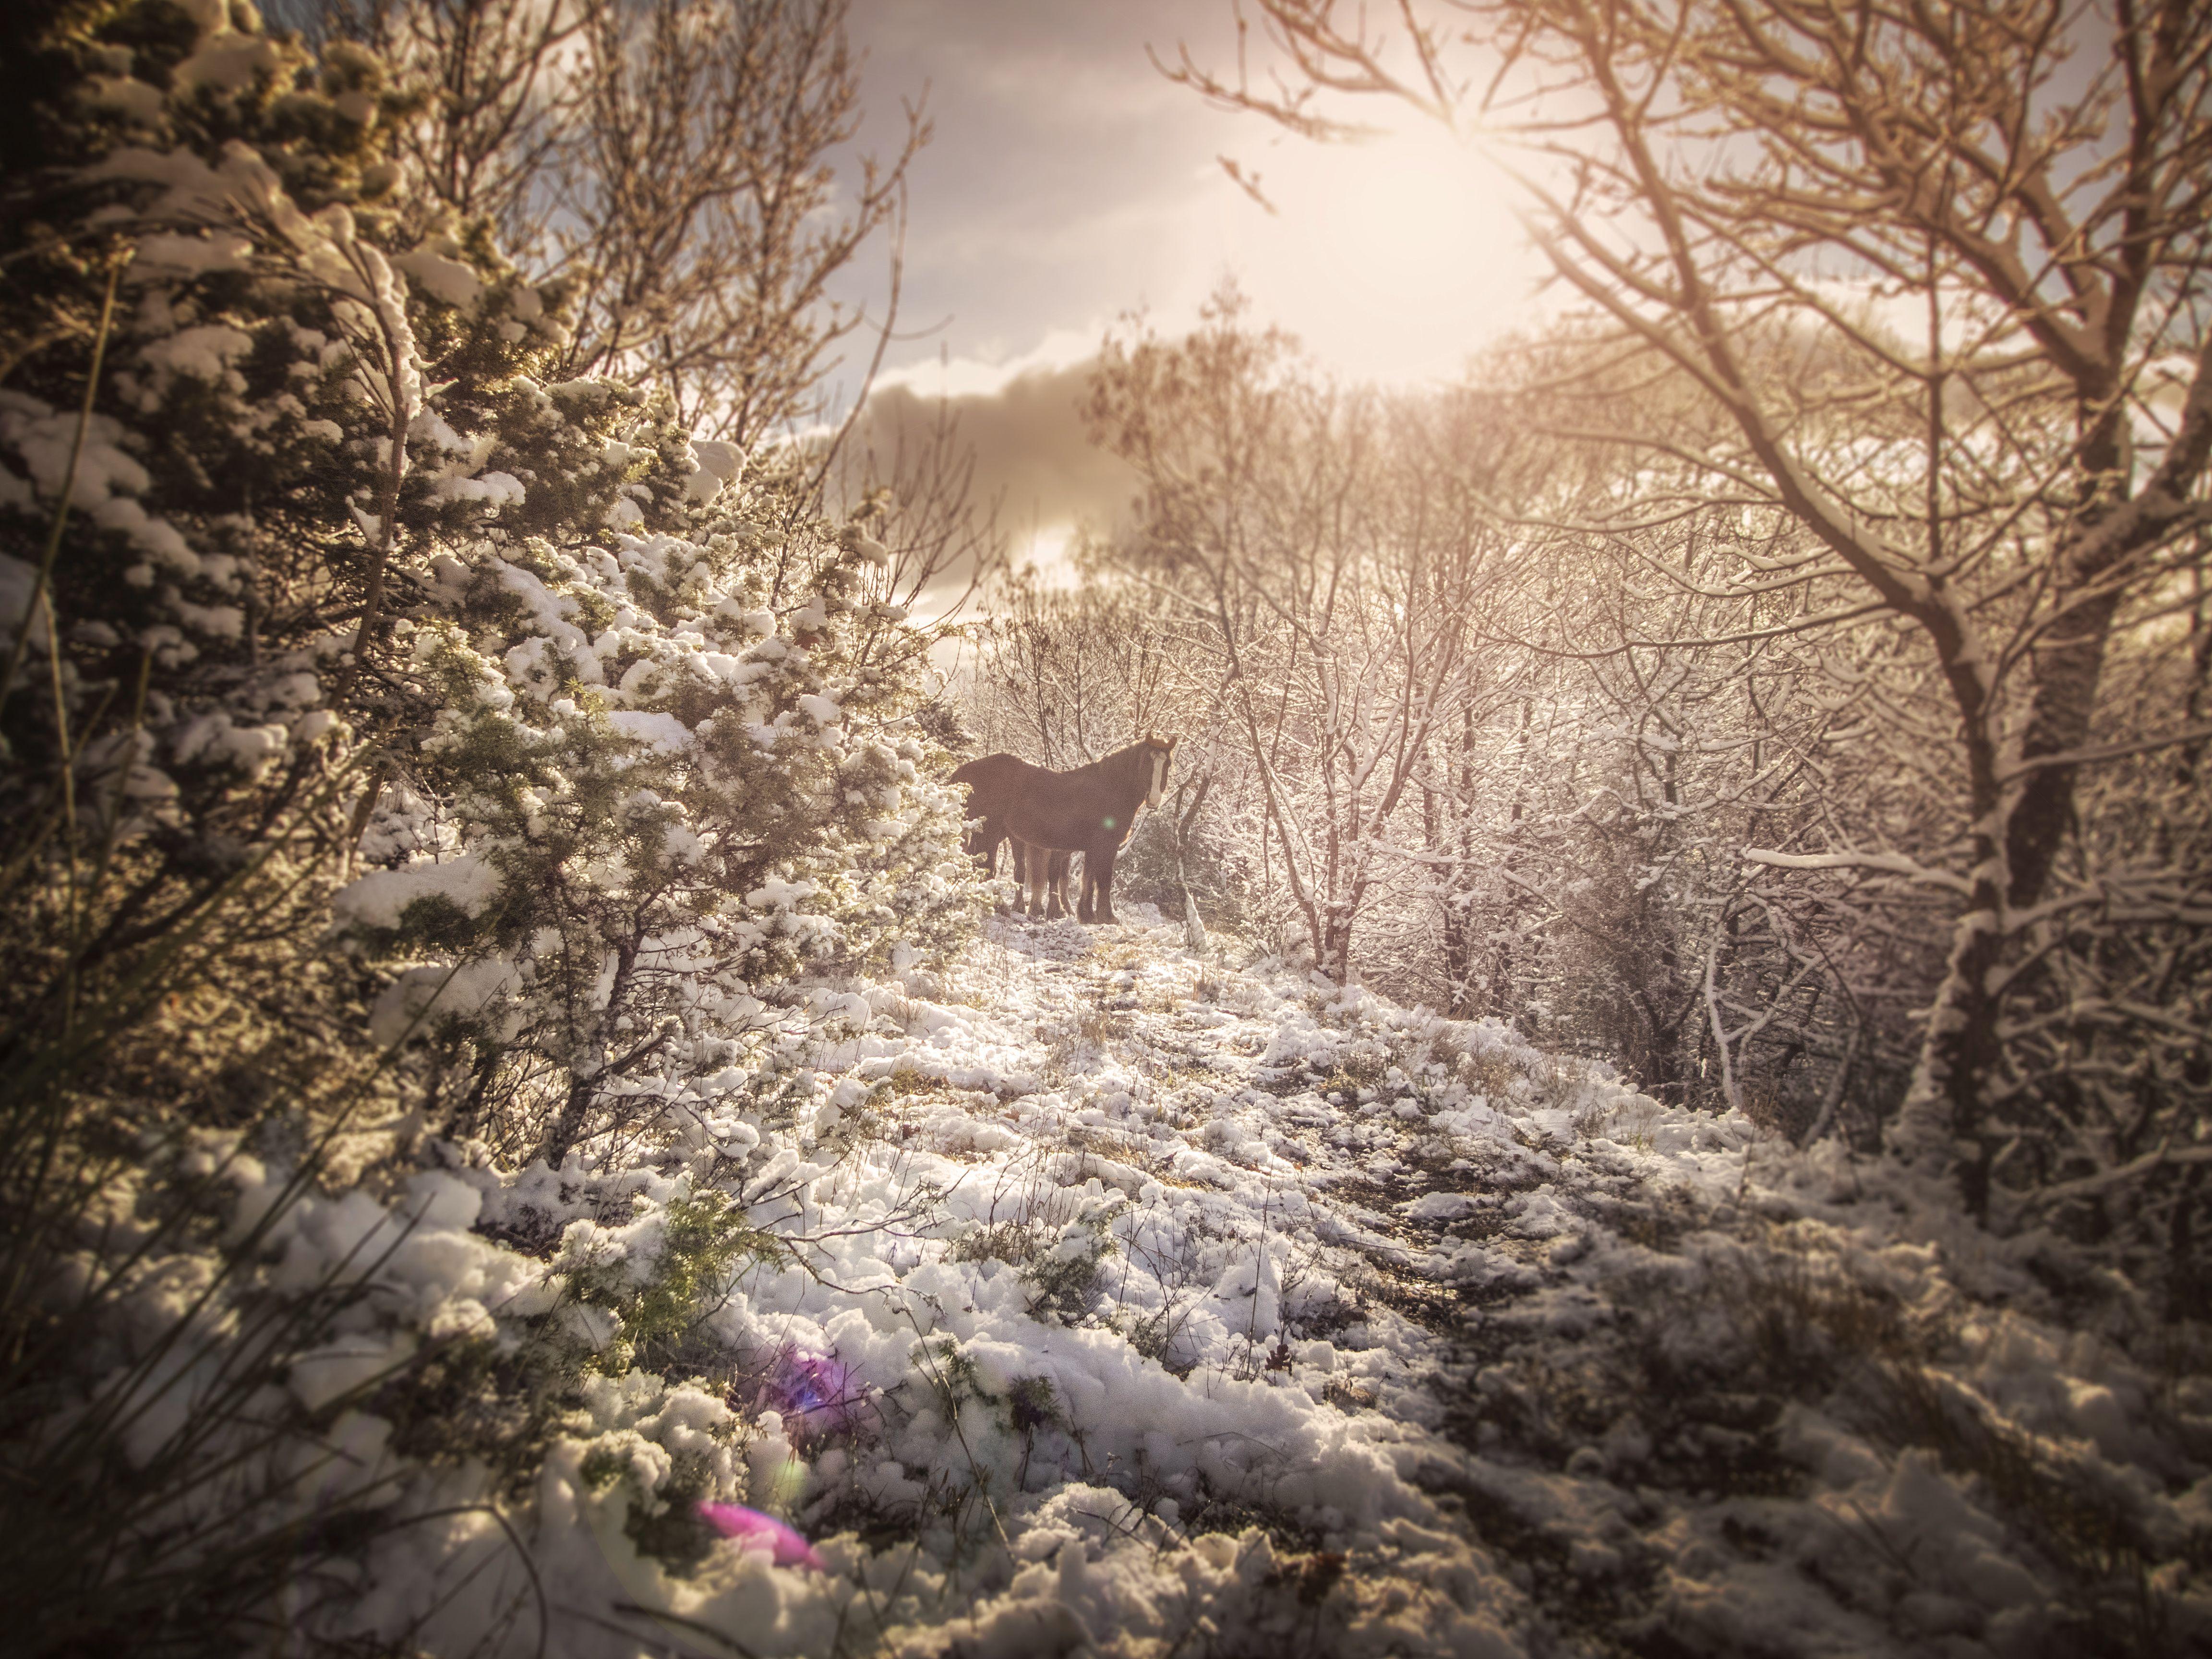 #wildlife #horses #travel #gurusays #snow #mountain #pace